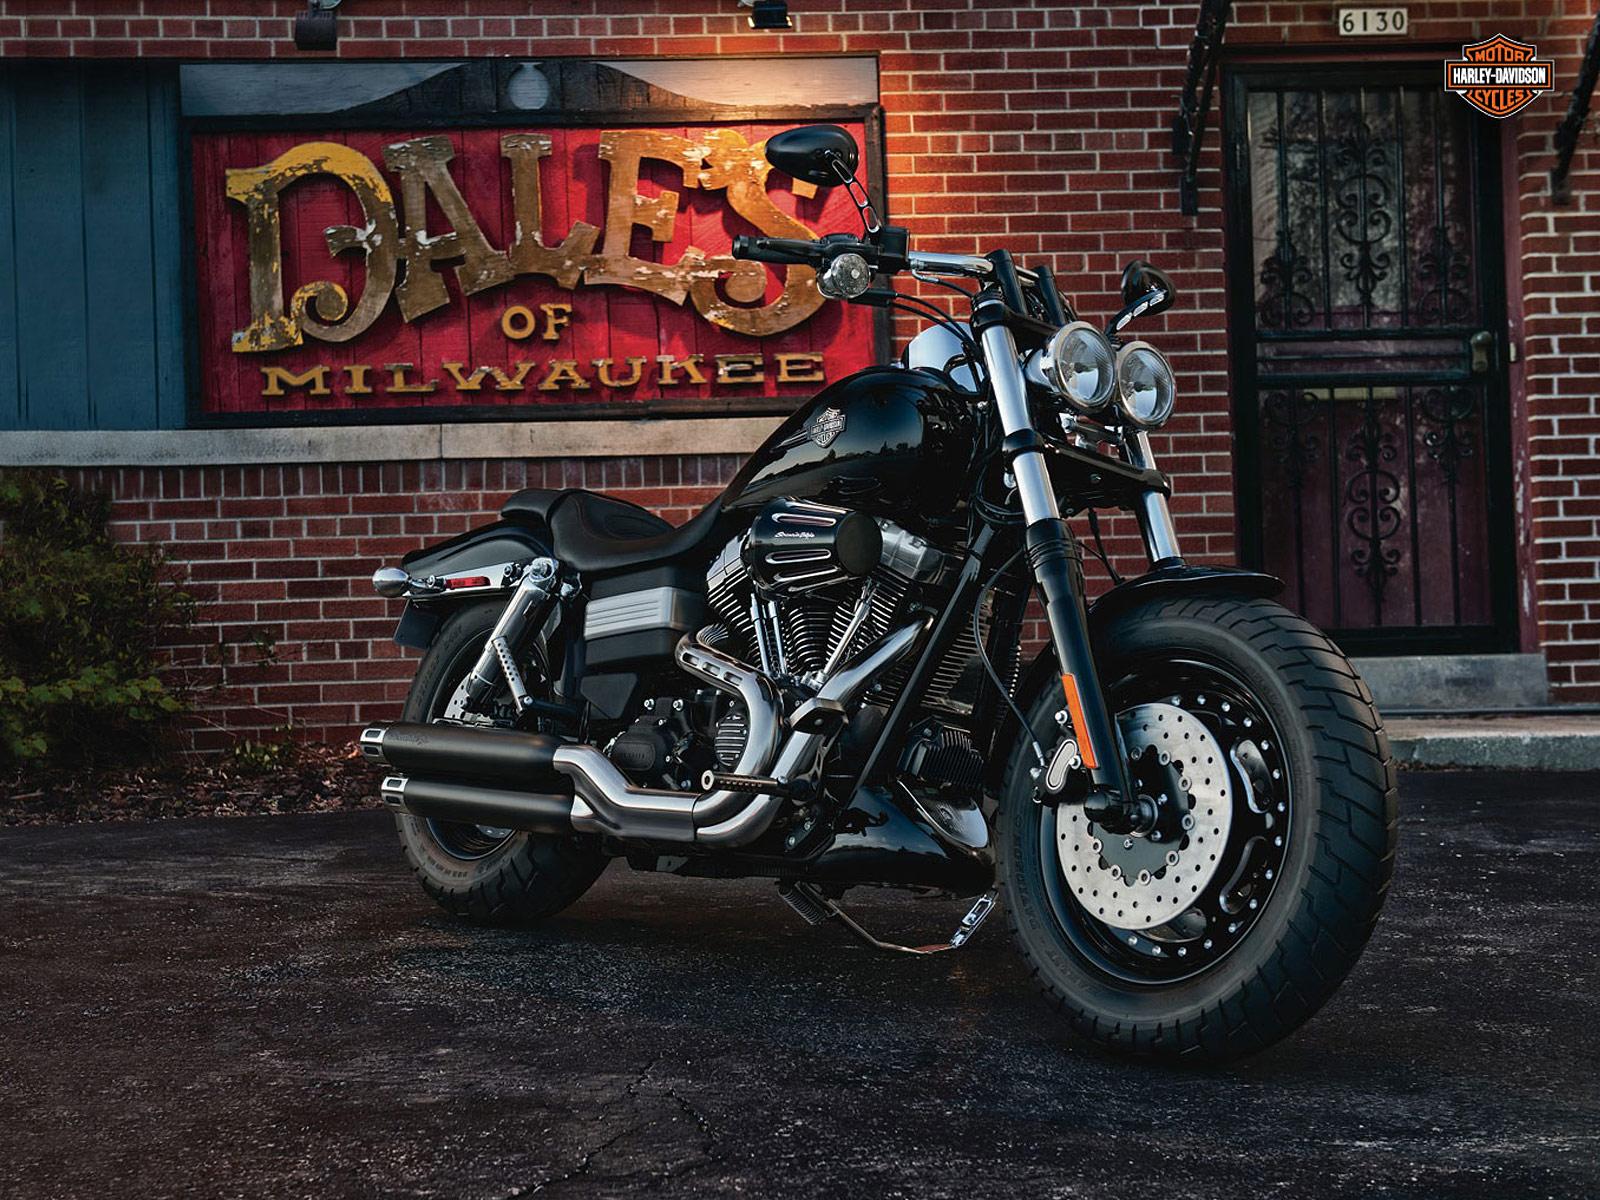 Harley Davidson Bob: 2012 FXDF Dyna Fat Bob Harley-Davidson Pictures, Review, Specs